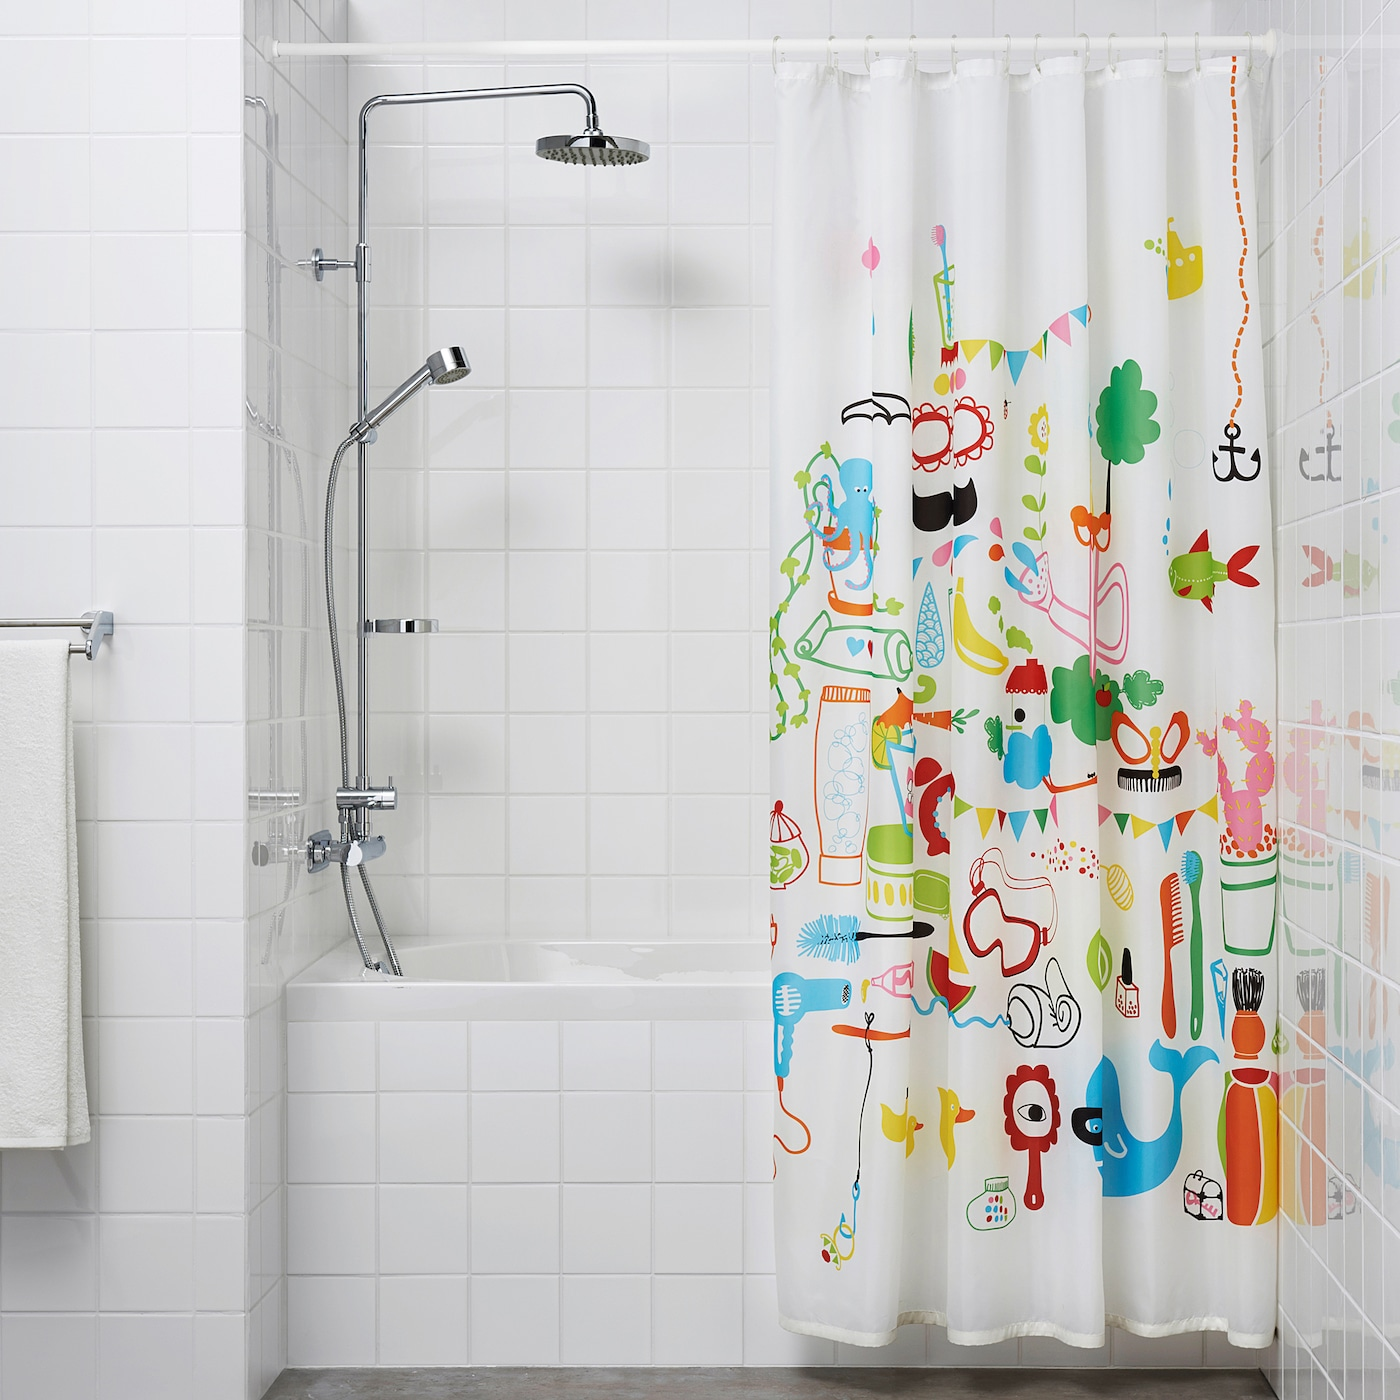 Botaren Shower Curtain Tension Rod